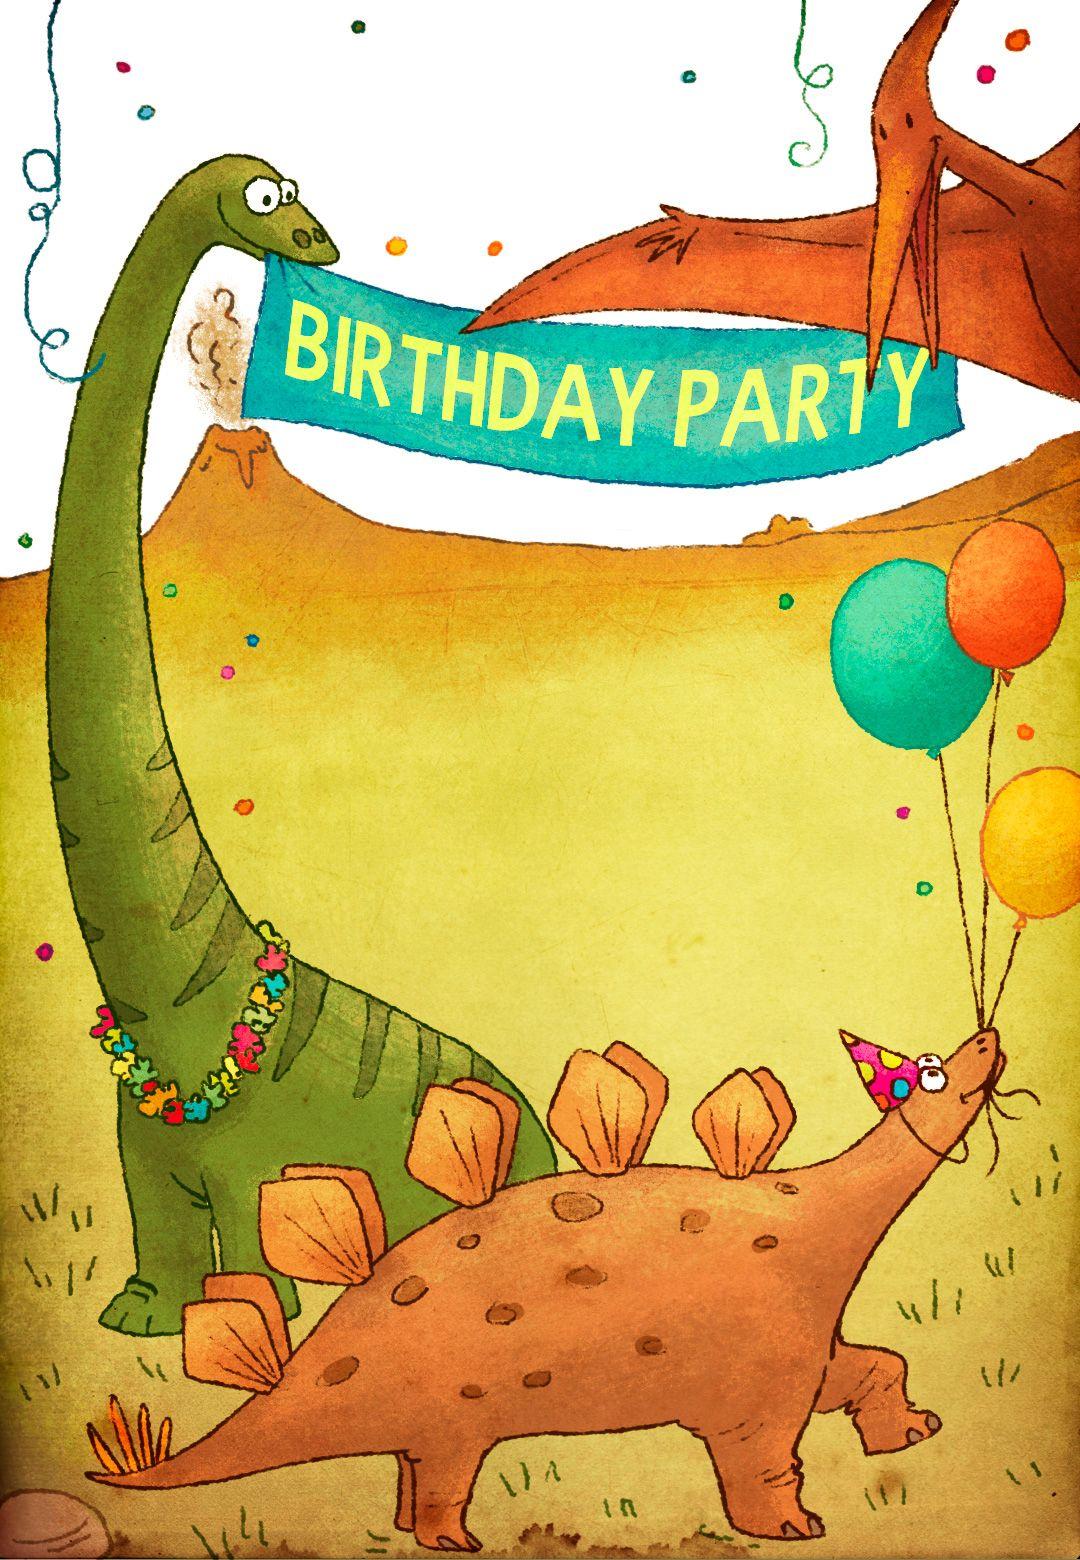 Dinosaurs Birthday Party - Free Printable Birthday Invitation - Free Printable Dinosaur Birthday Invitations